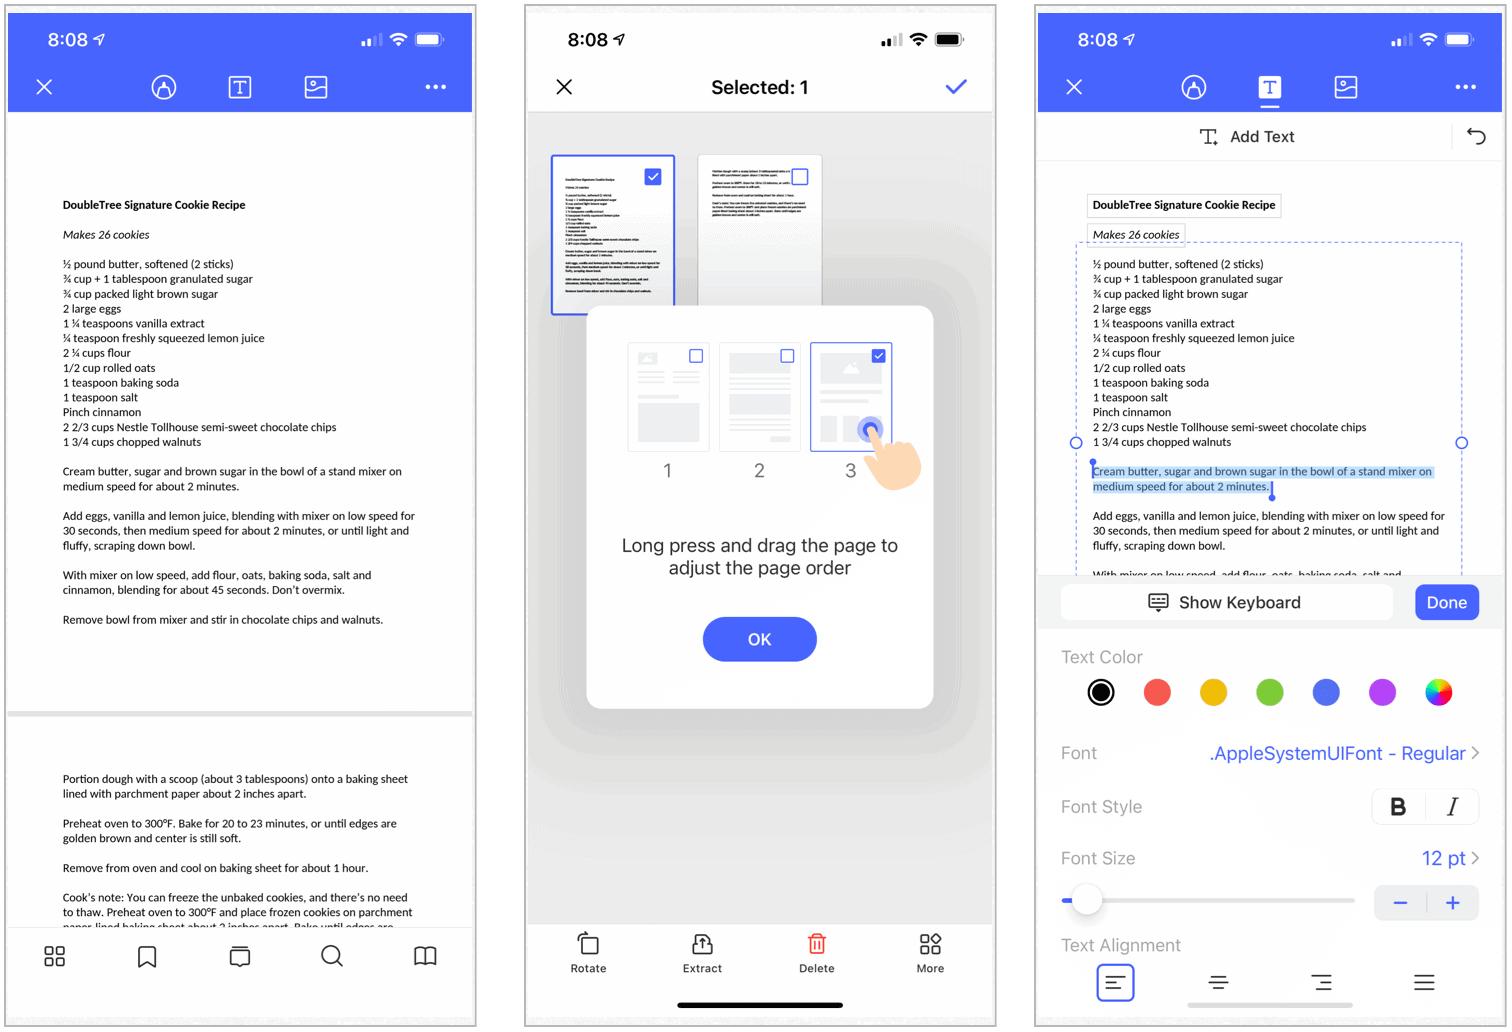 PDFexpert Pro on iPhone